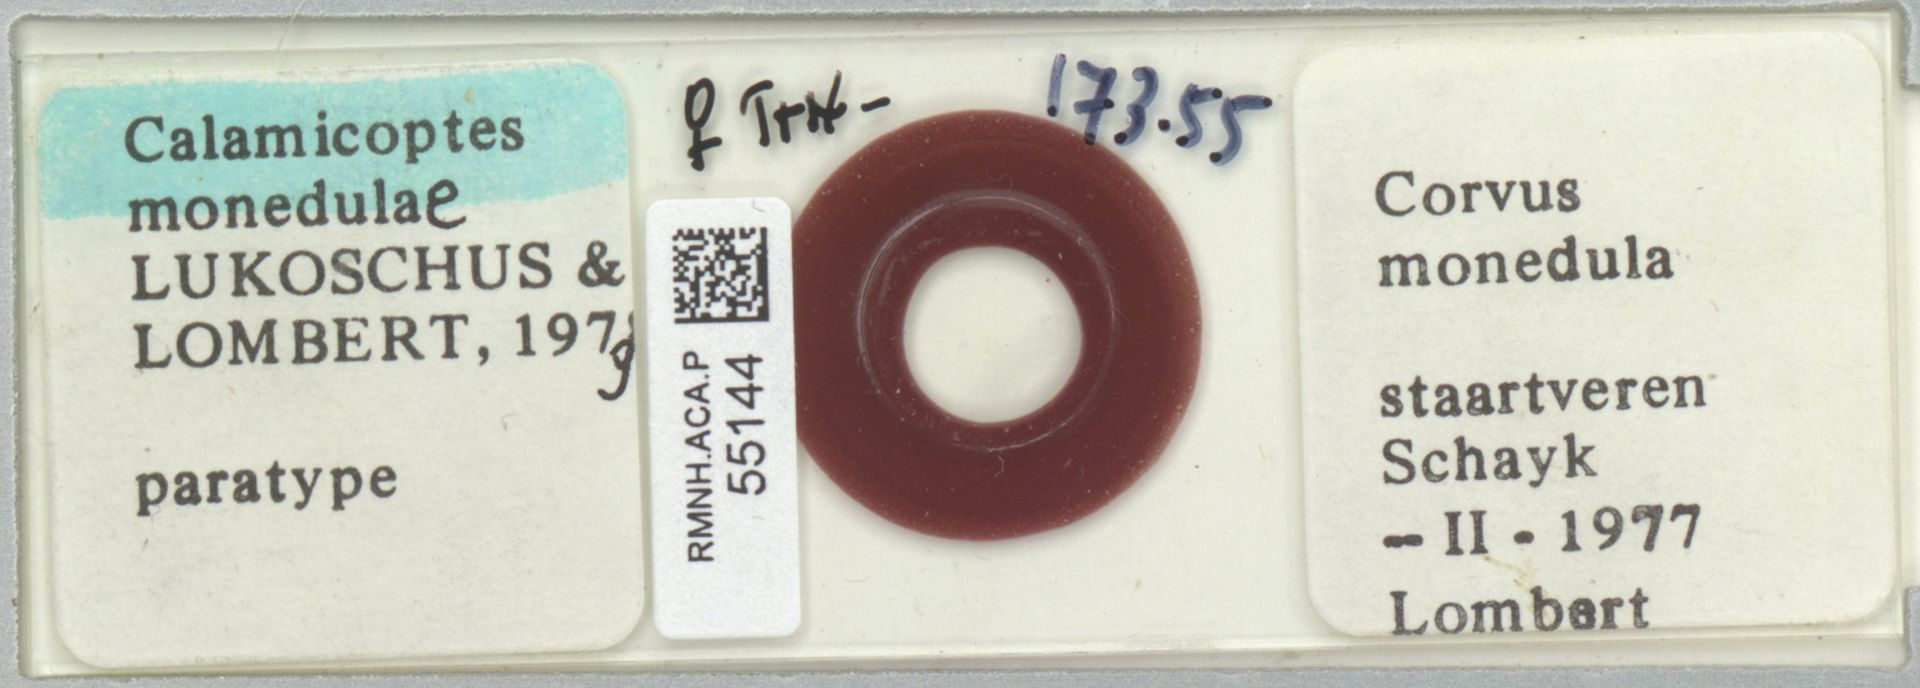 RMNH.ACA.P.55144 | Calamicoptes monedulae Lukoschus & Lombert 1979